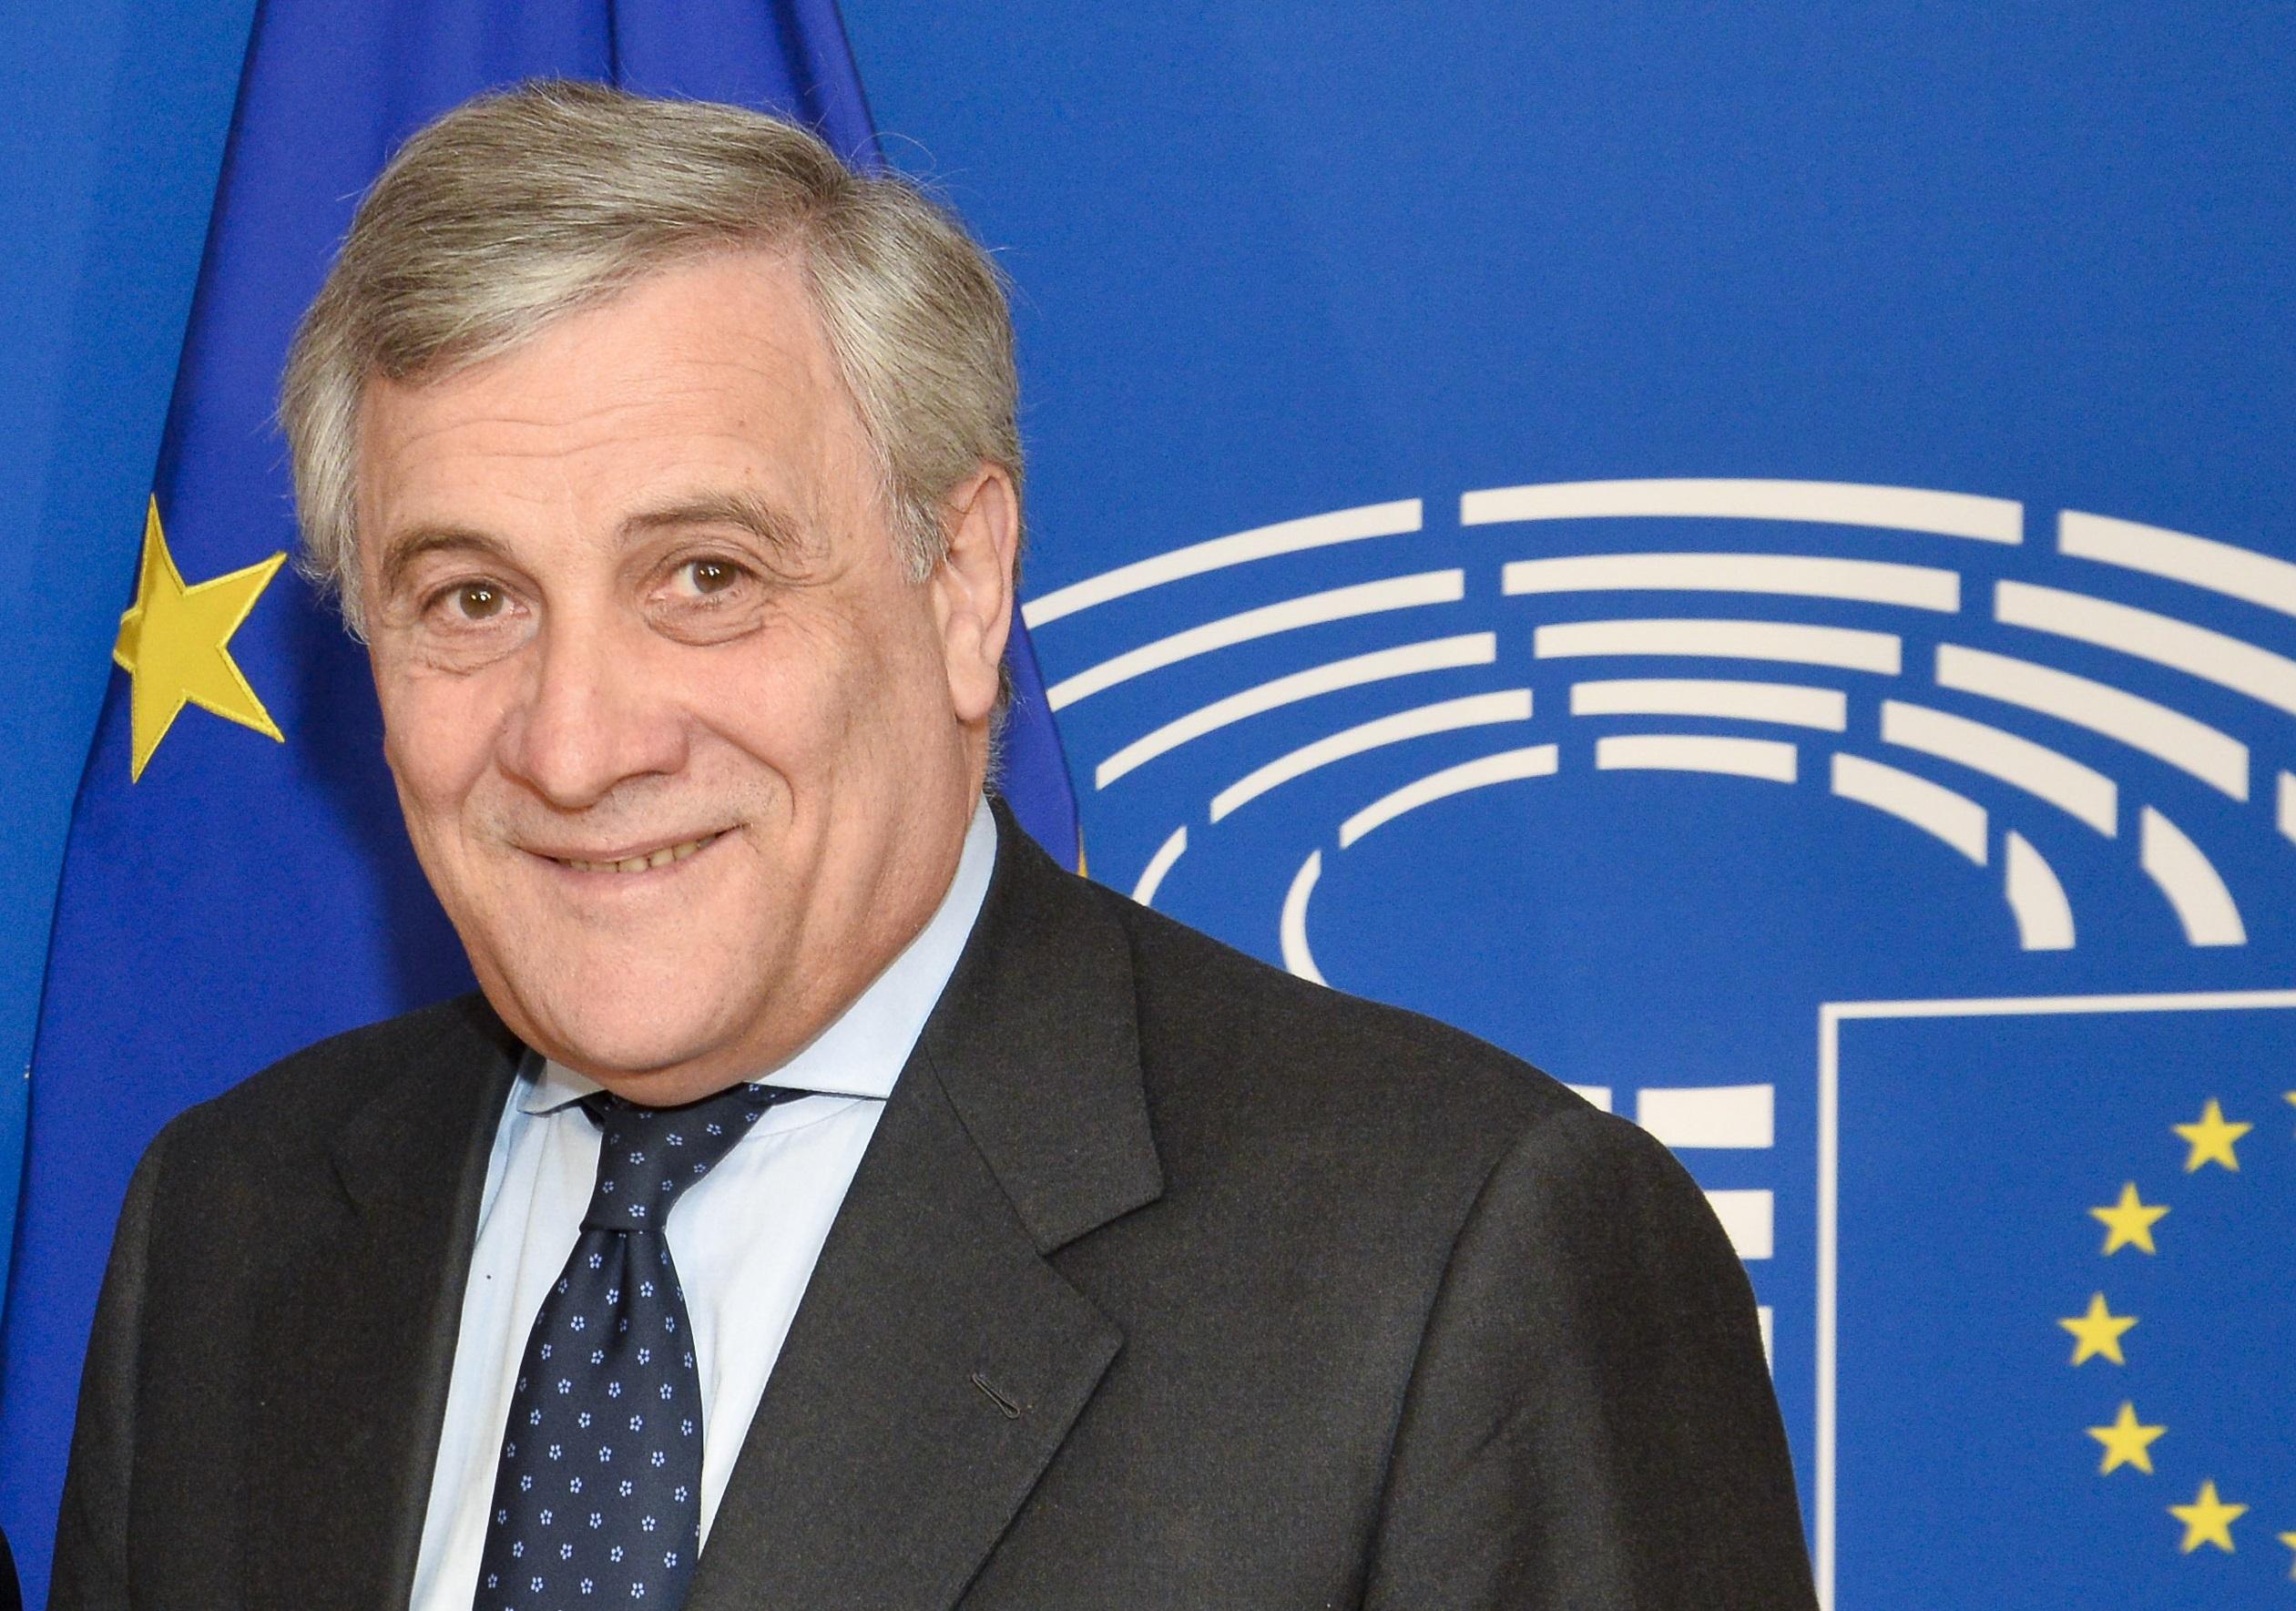 Portrait of President Tajani